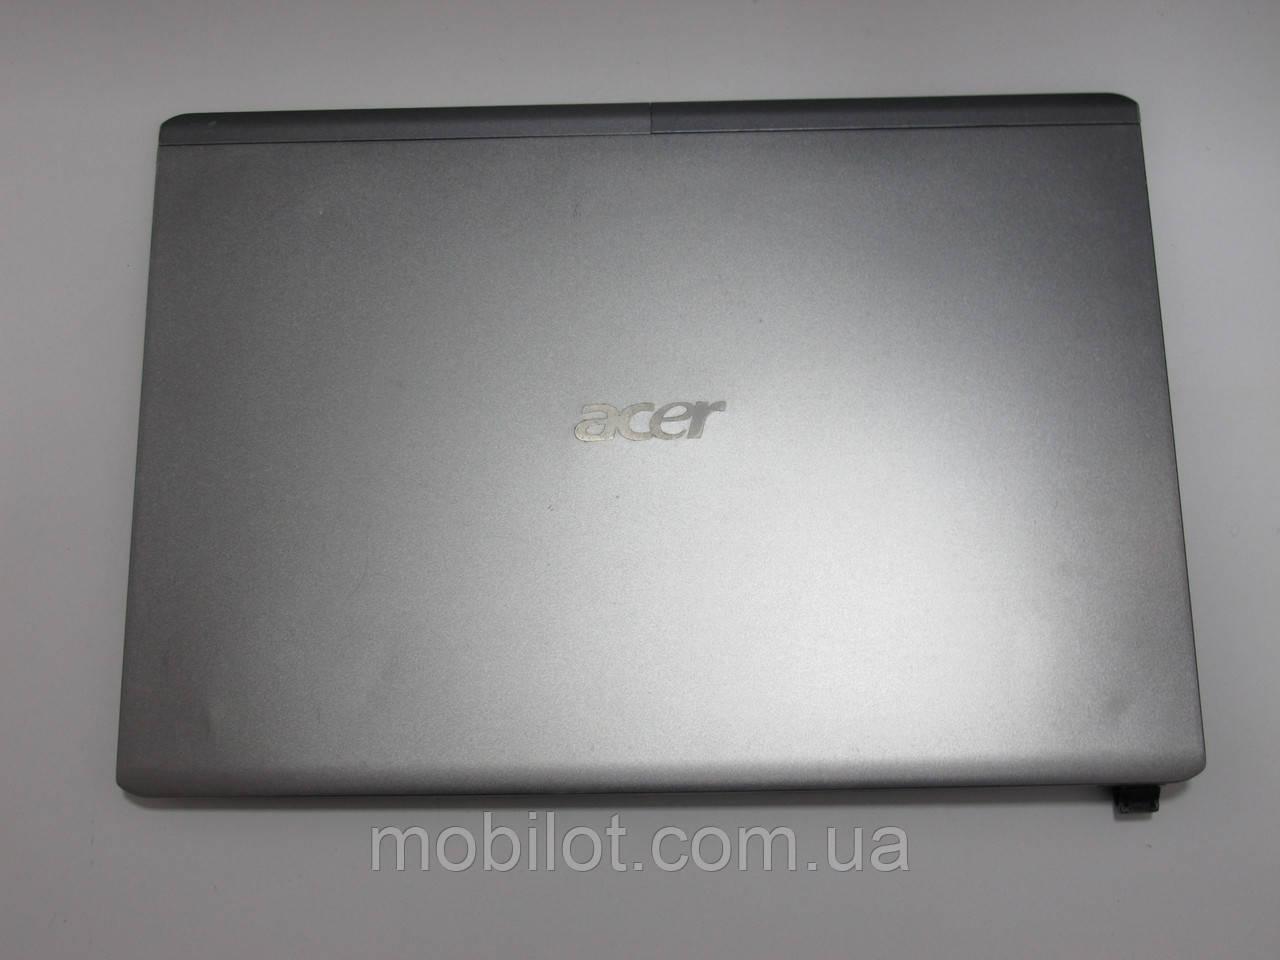 Часть корпуса (Крышка матрицы) Acer 4810T (NZ-4663)